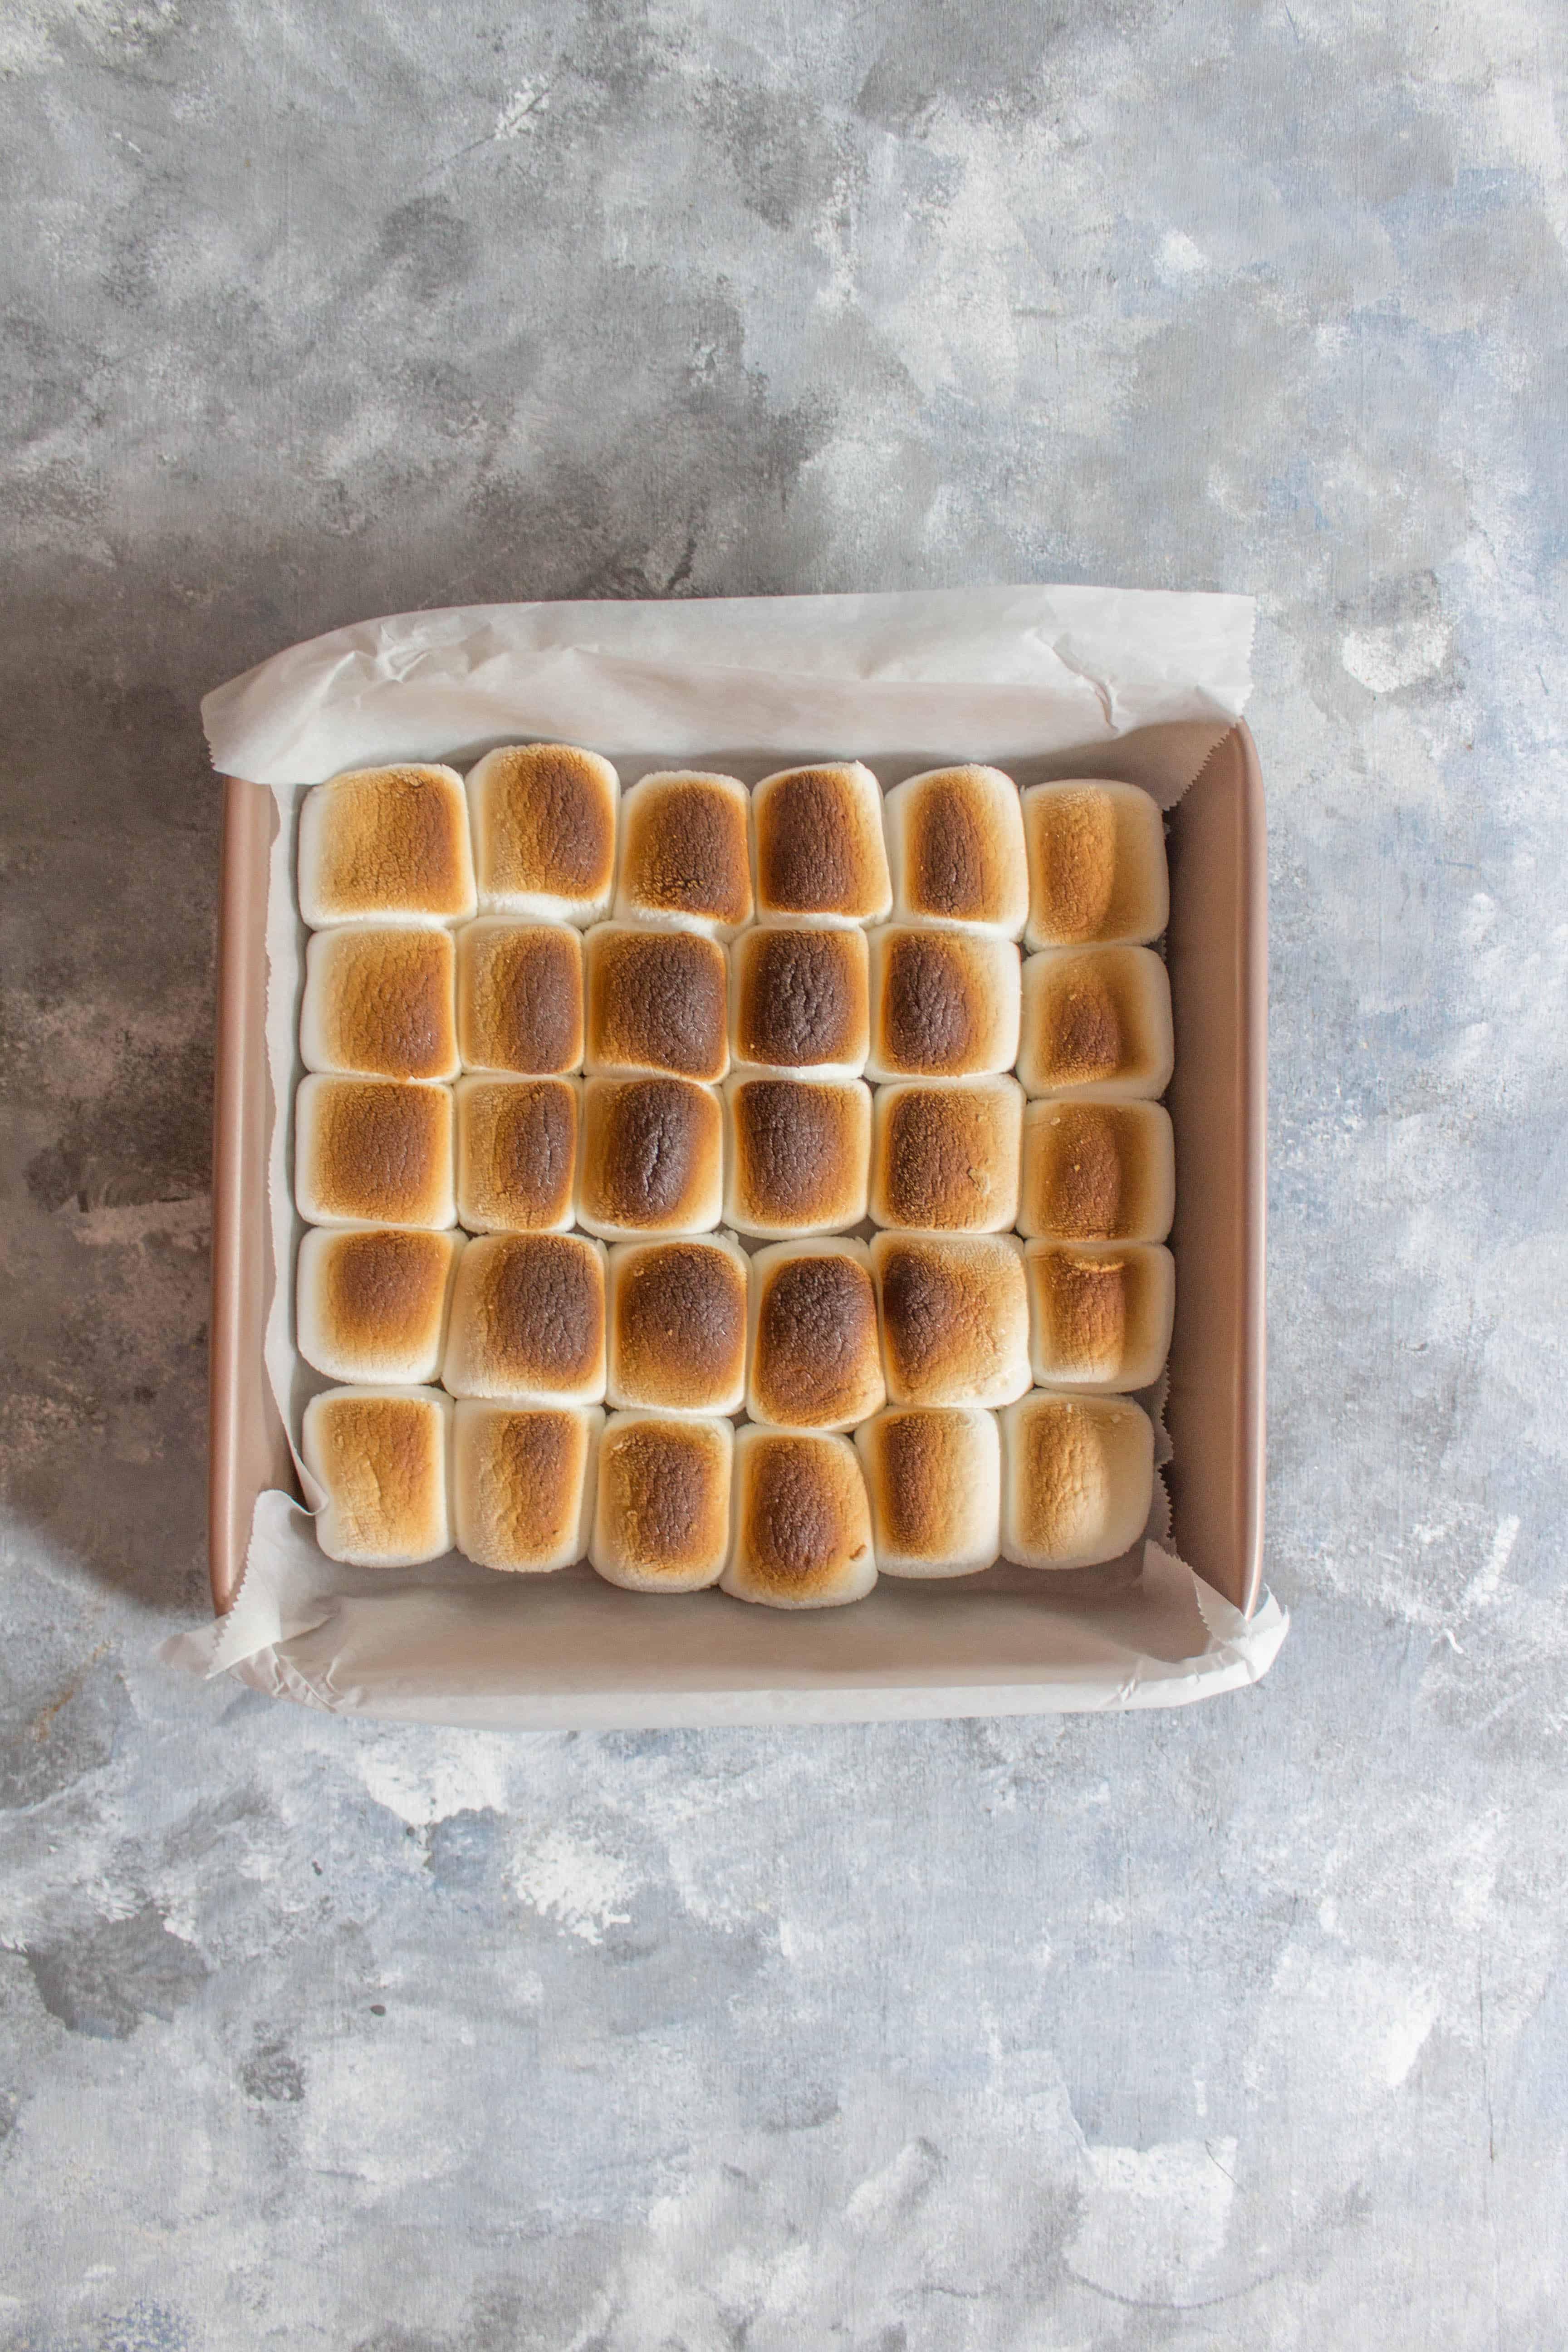 Toasted Marshmallow and Oreo Milkshake